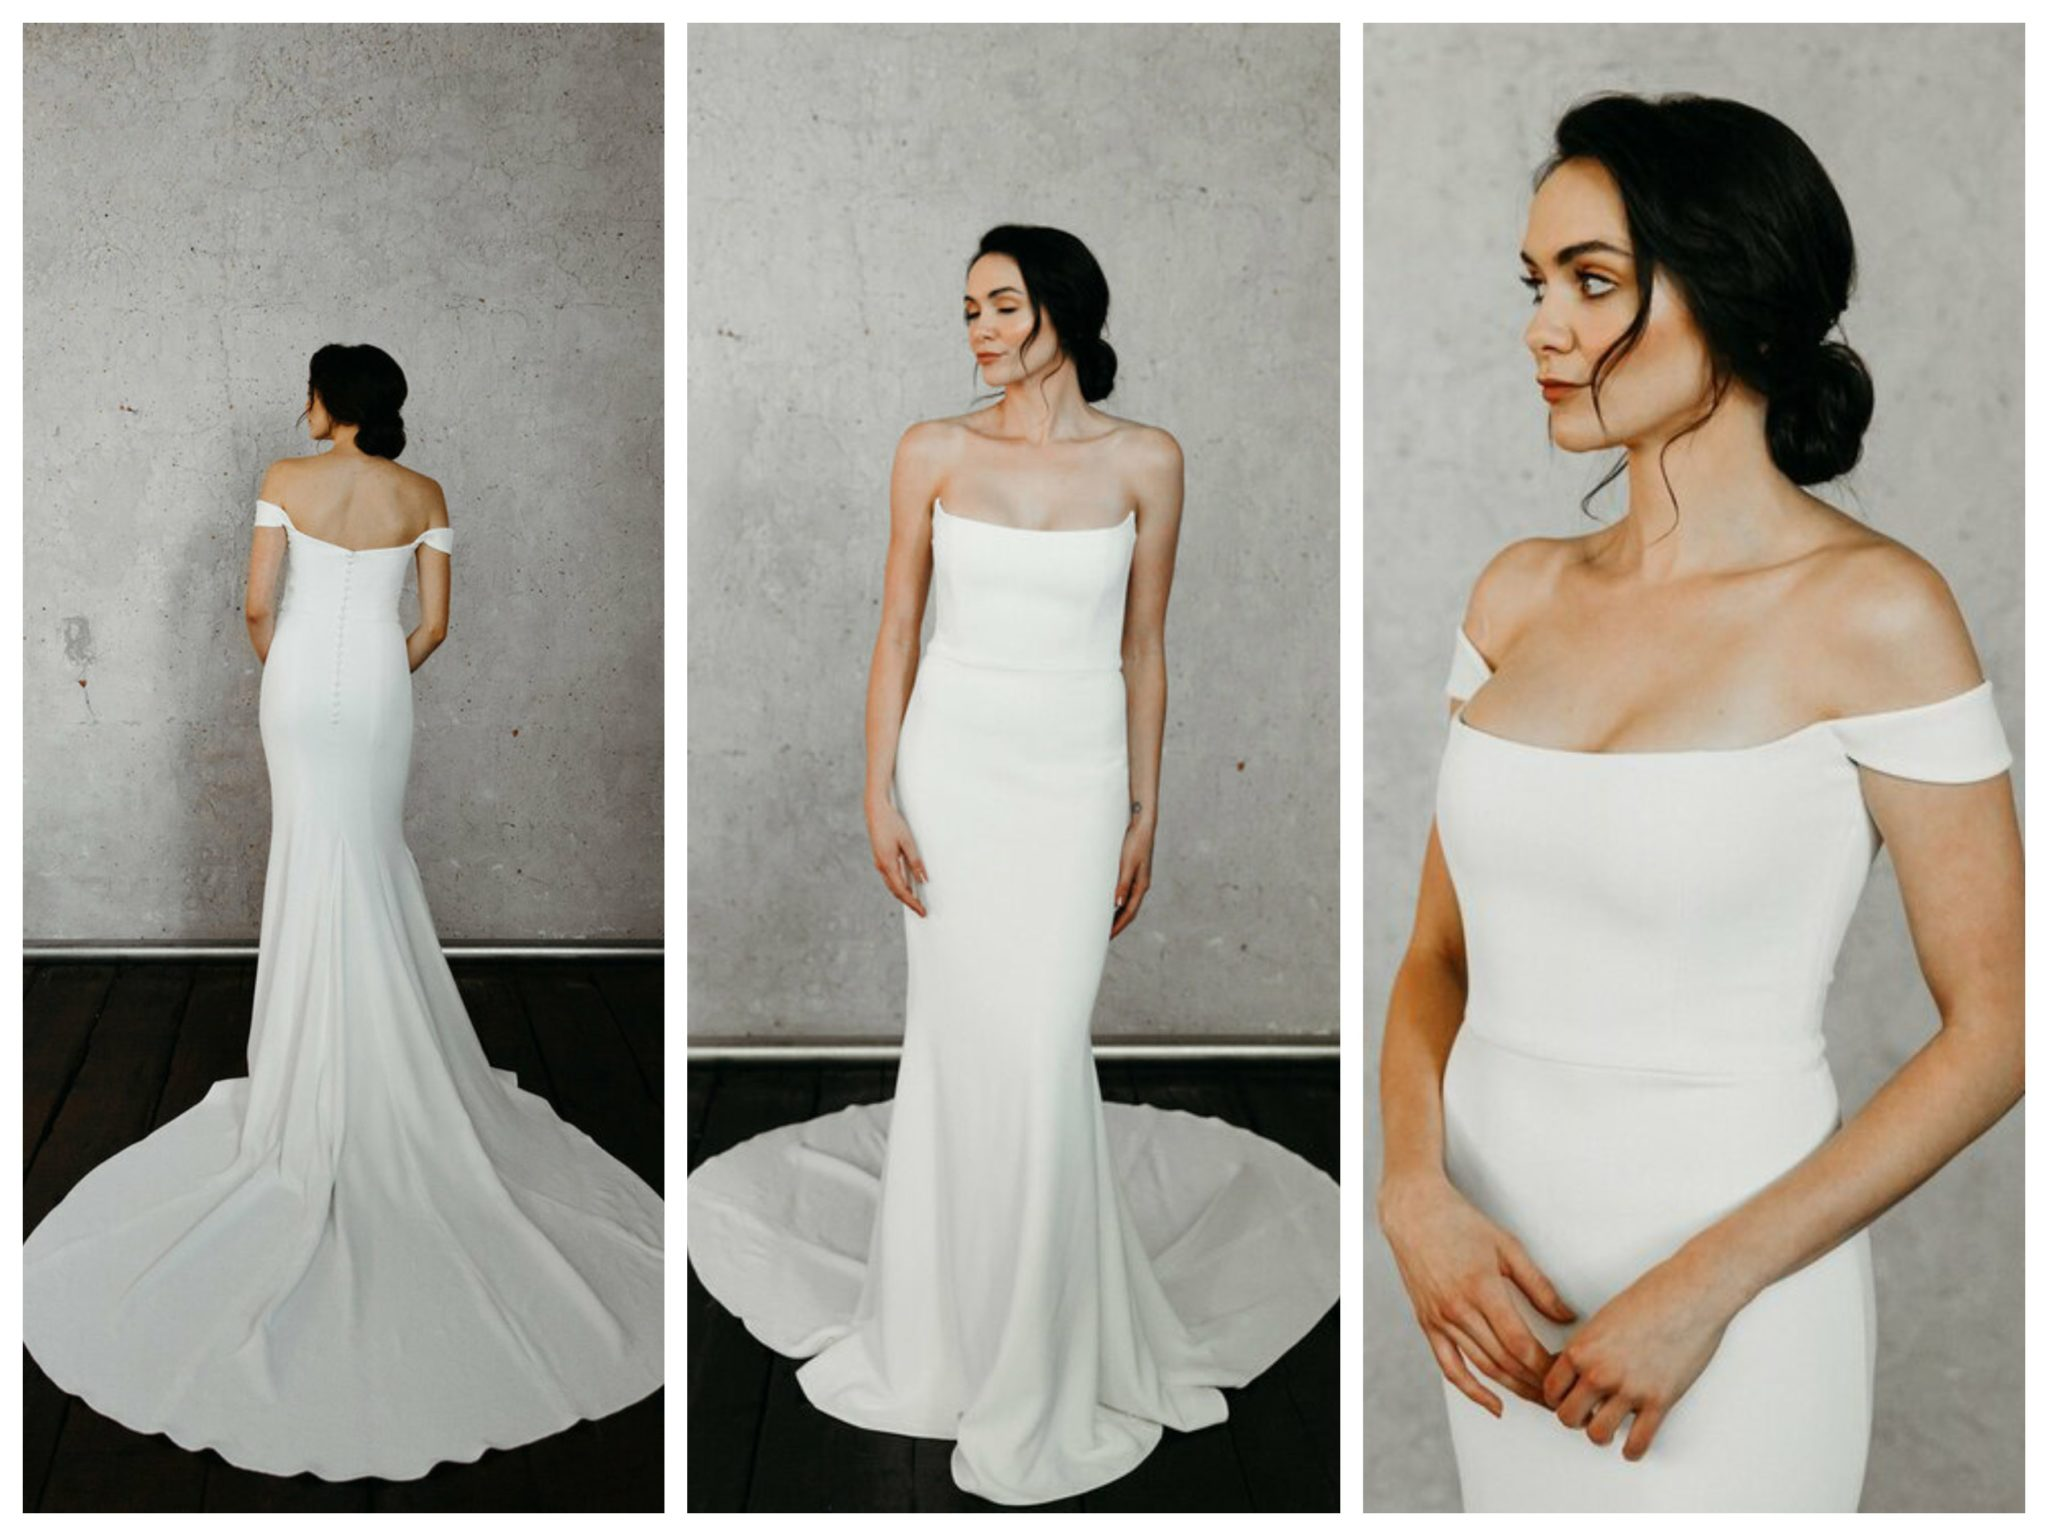 Wedding dresses for broad shoulders by top Los Angeles bridal shop, Love and Lace Bridal Salon: Alyssa Kristin's Camilla